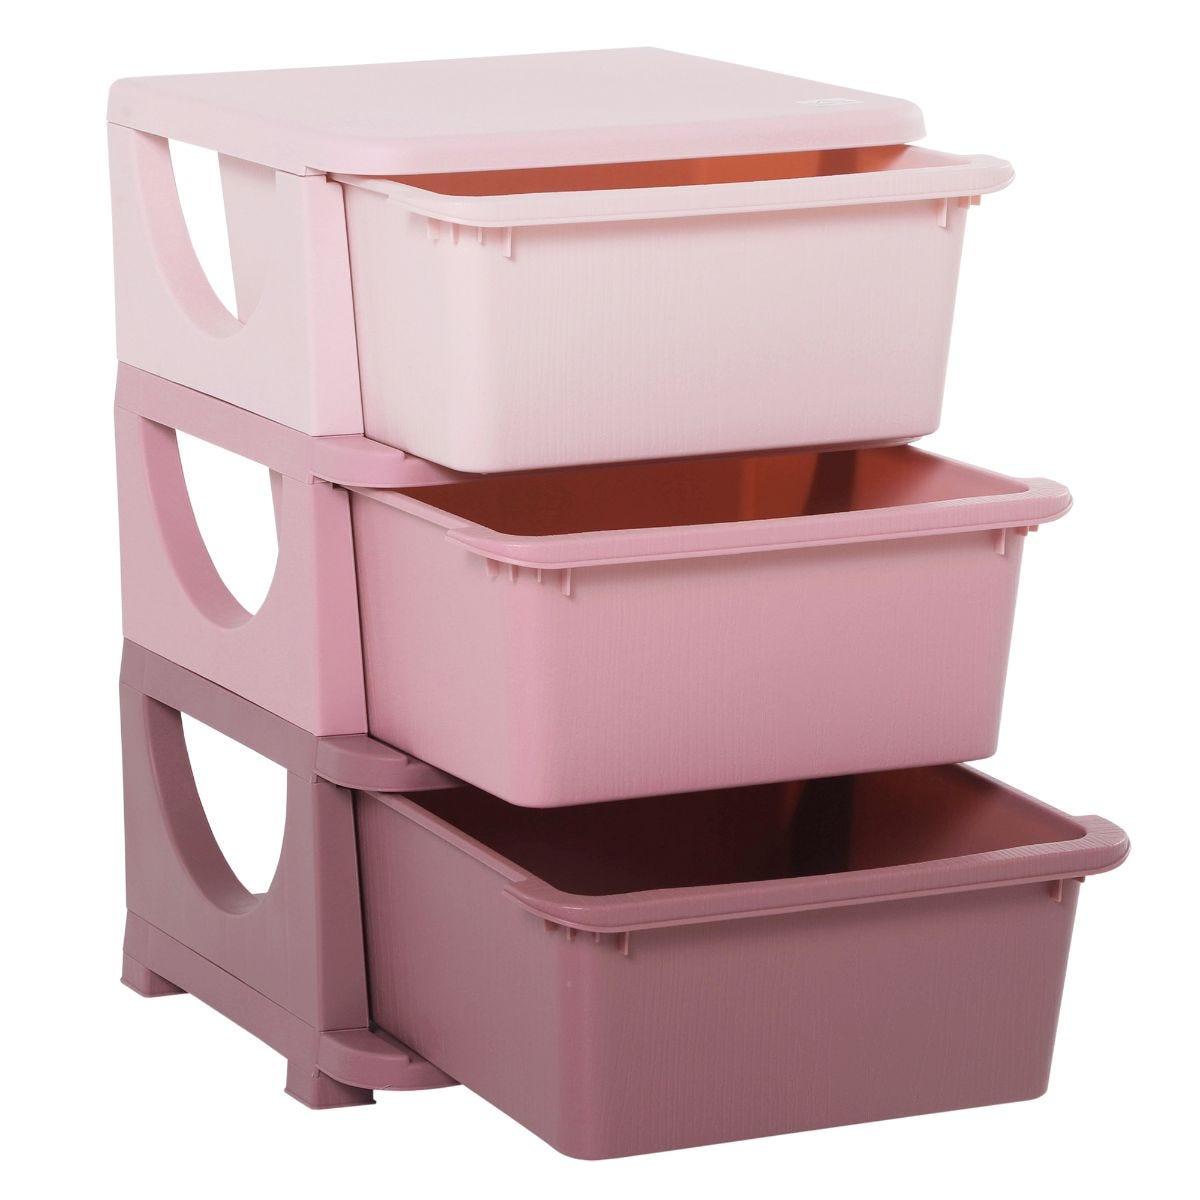 Kids Storage Unit with Drawers 3 Tier Chest Vertical Dresser Tower Pink